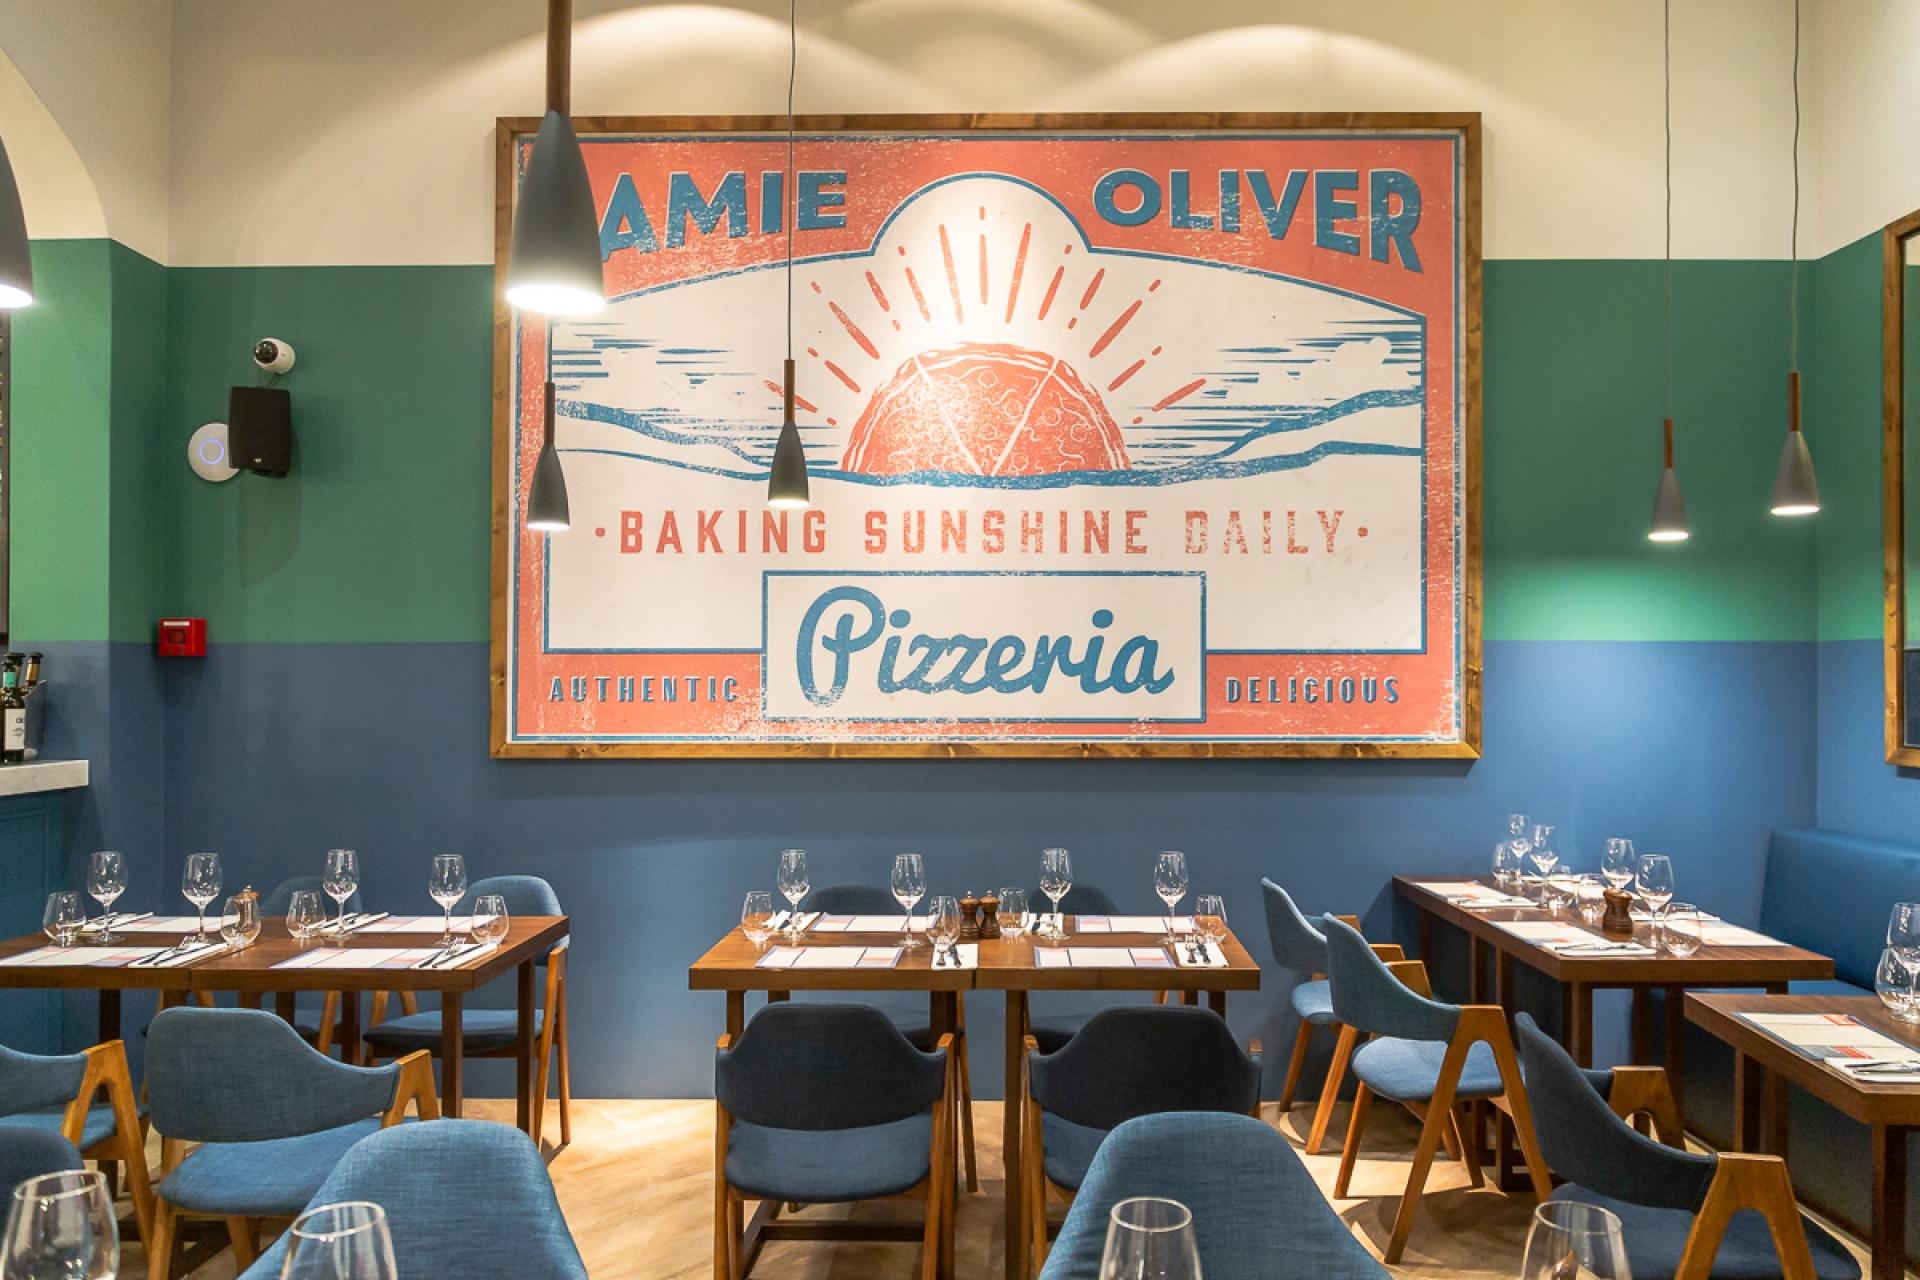 Lisboa Cool_Eat_Restaurant_Jamie Oliver Pizzeria